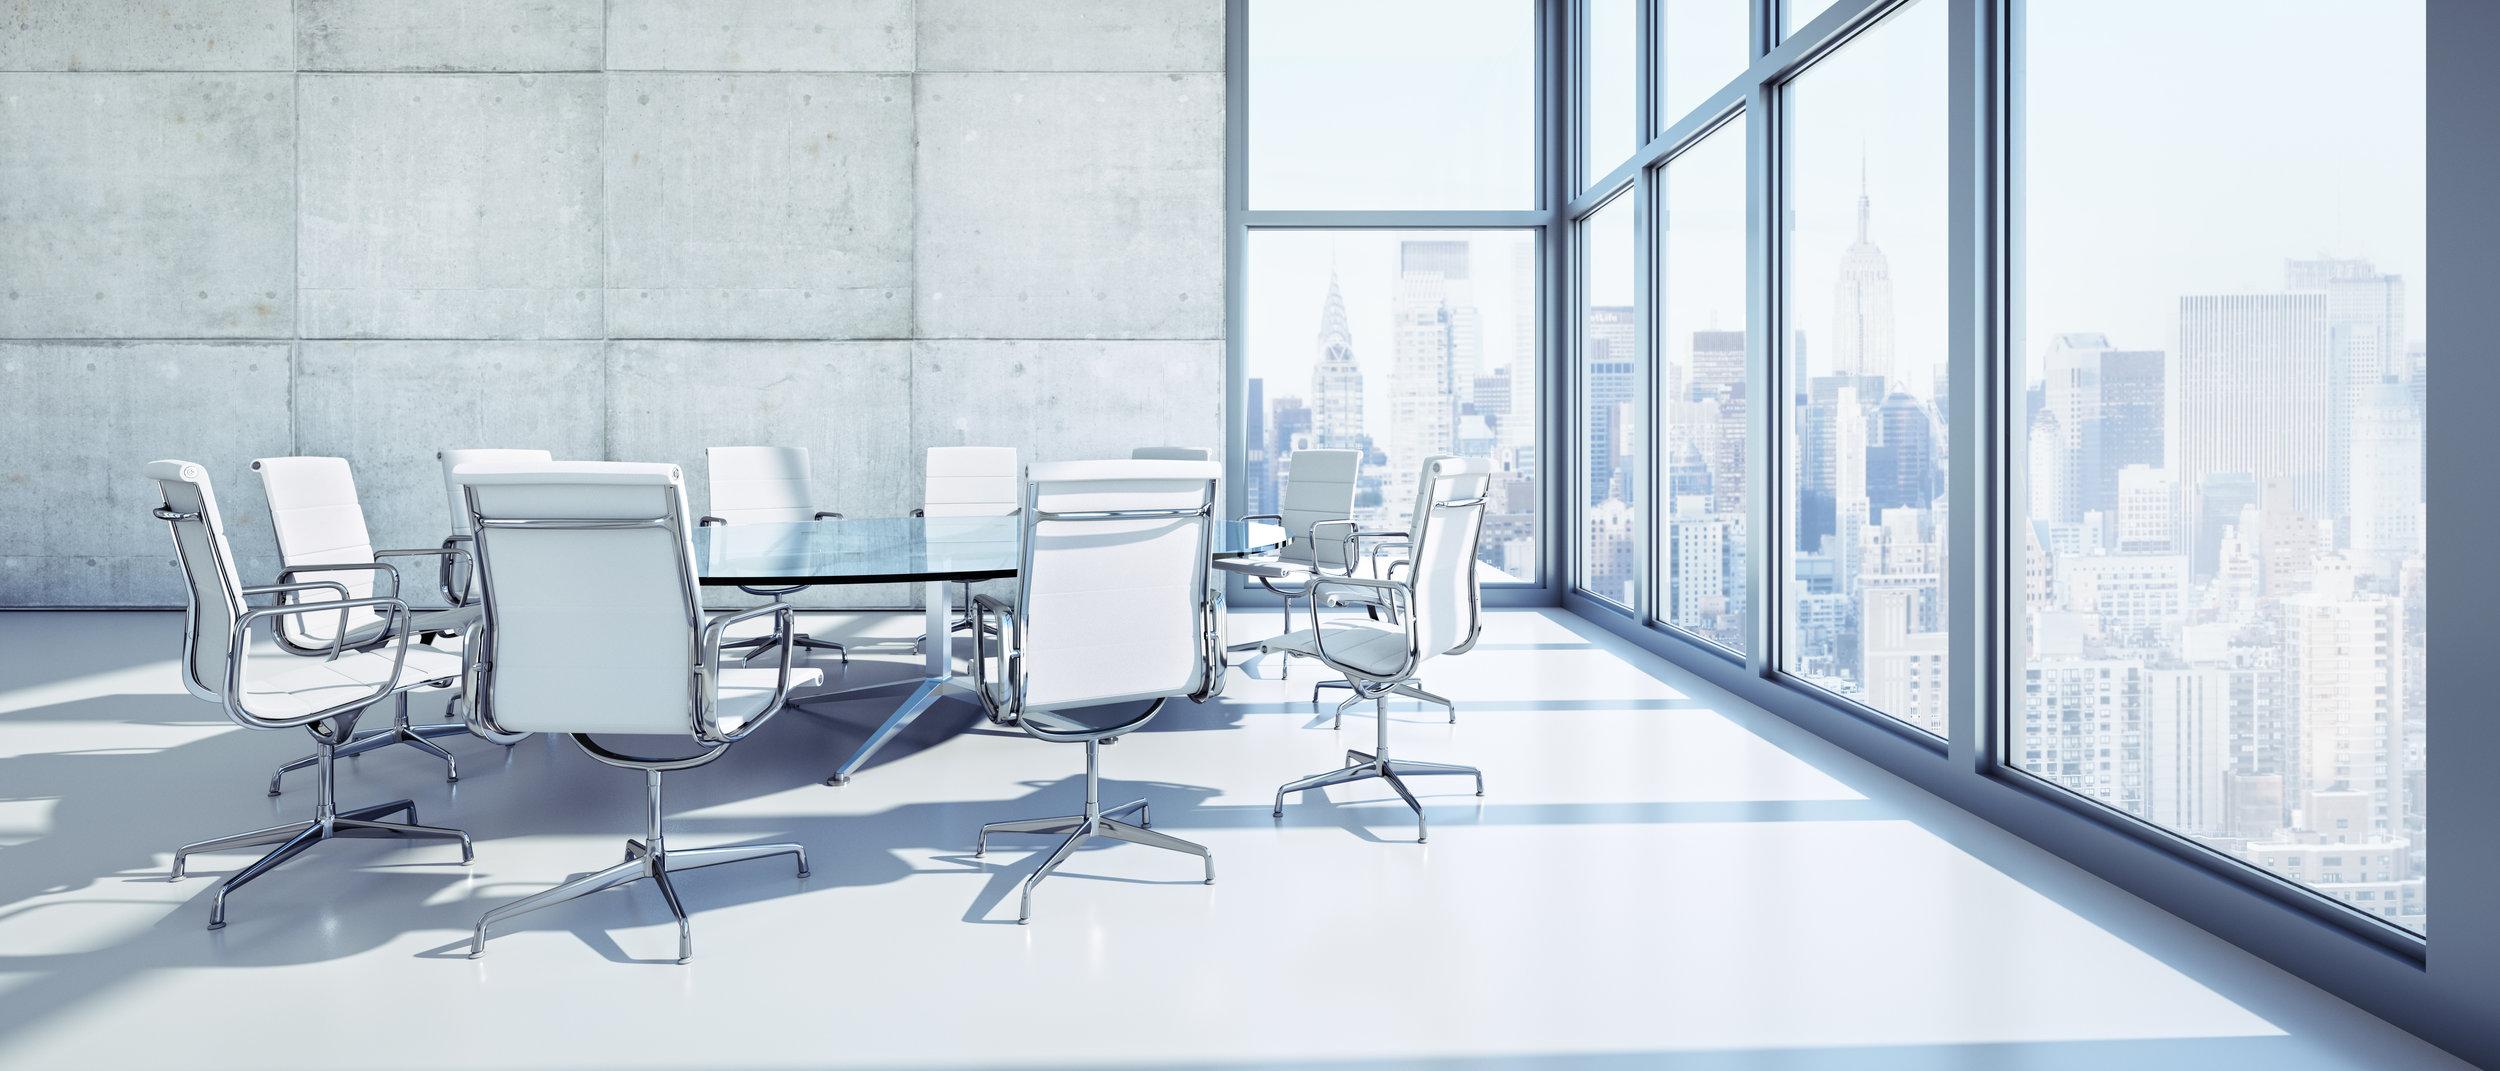 Meeting Room im Hochhaus